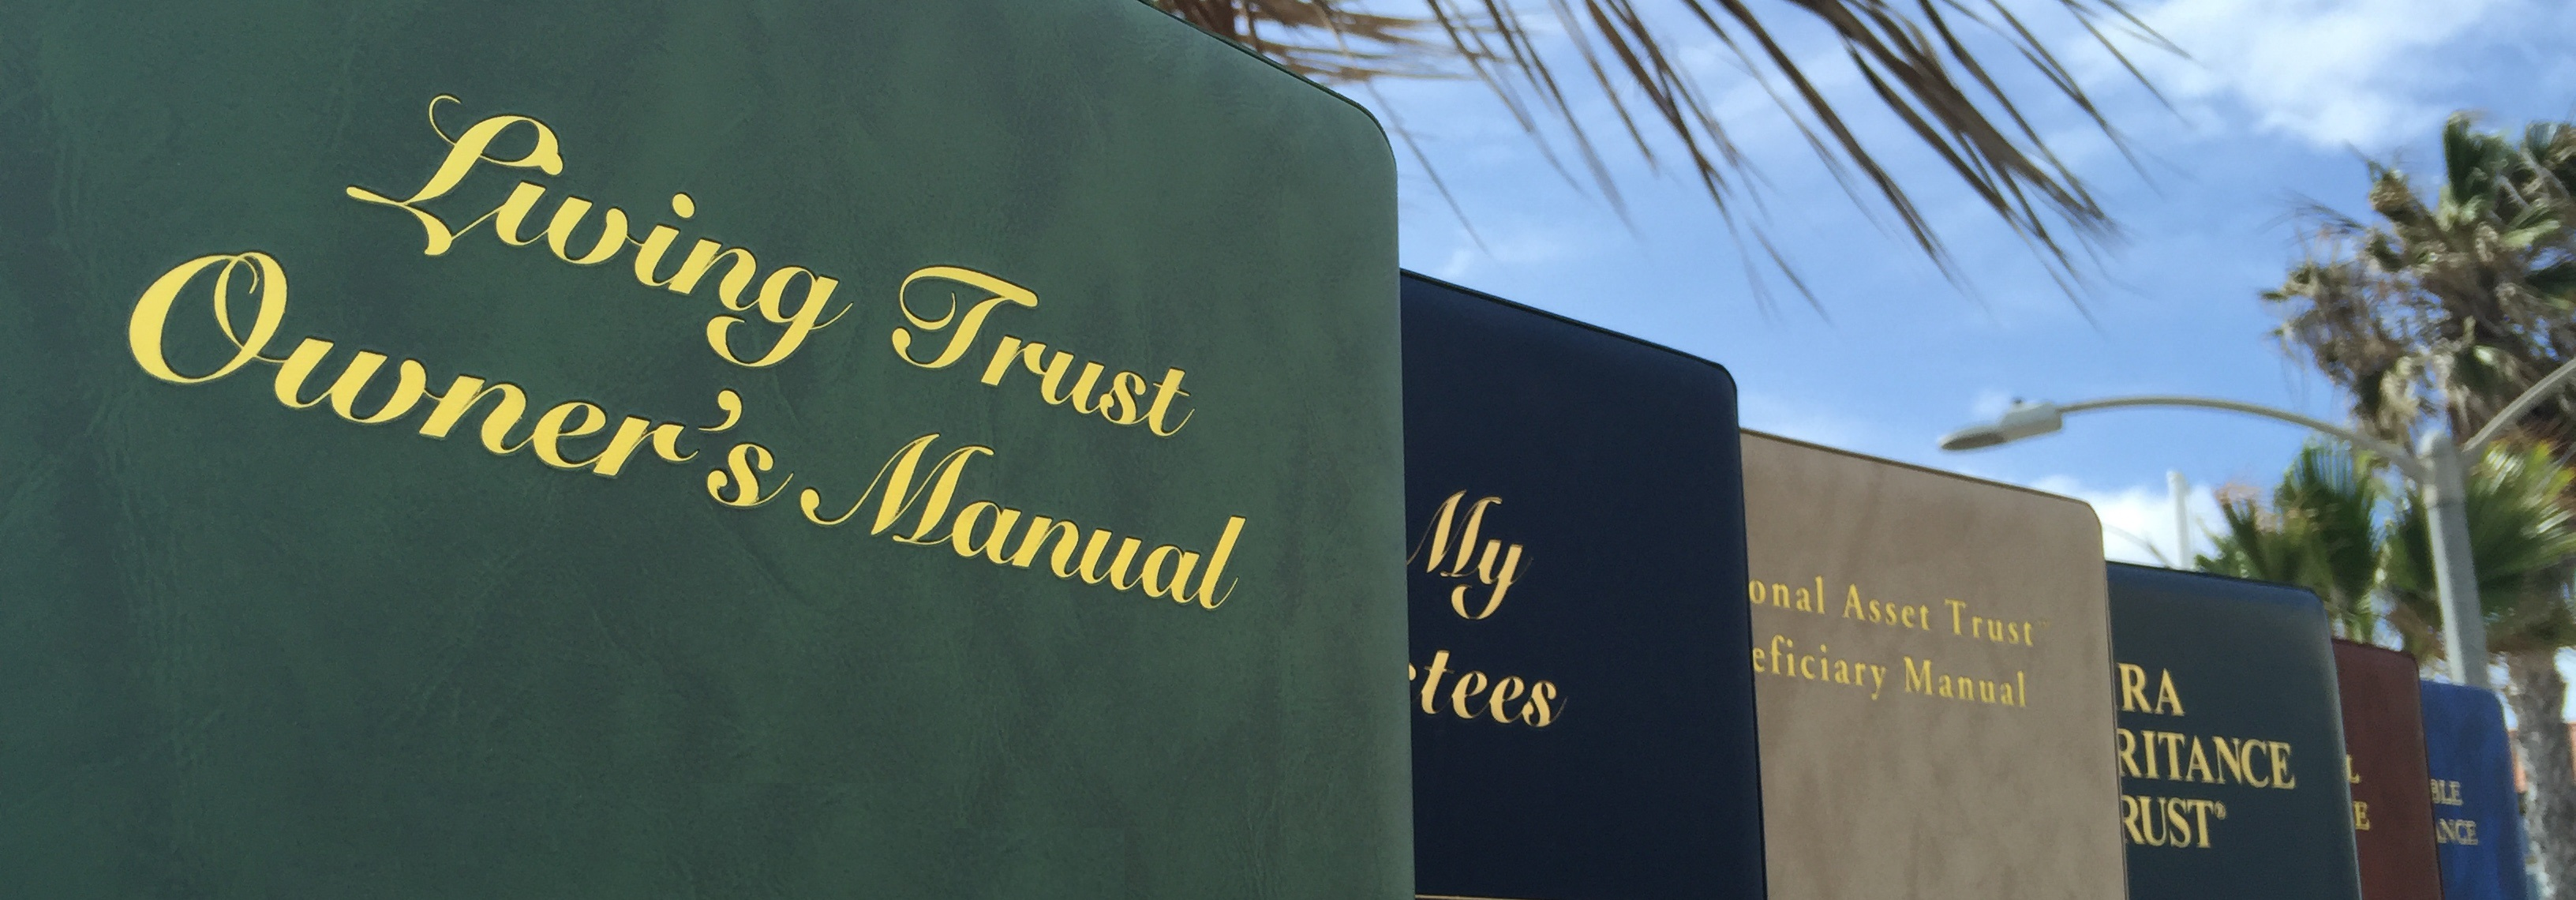 estate-planning-trust-forms